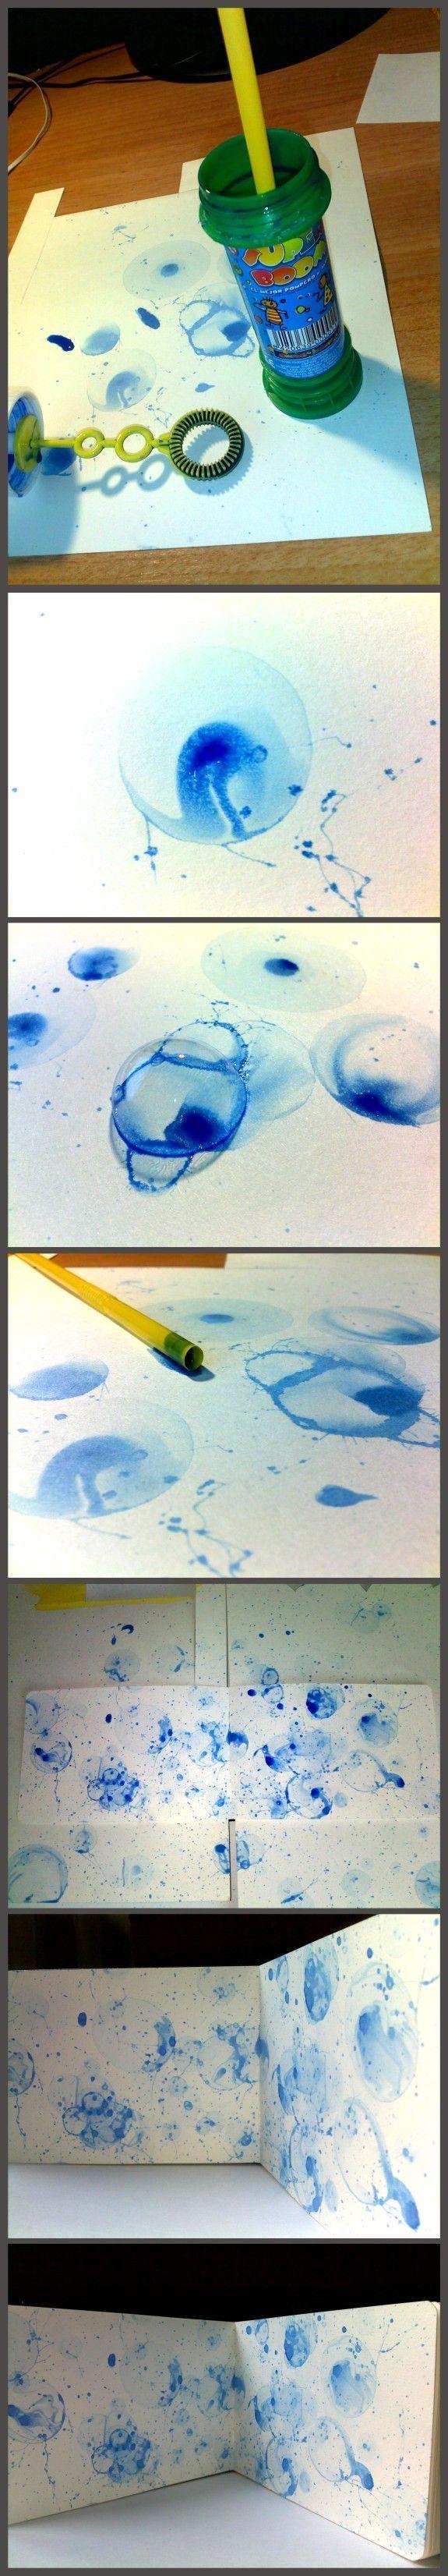 Painting with bubbles artful antics pinterest diy wall art